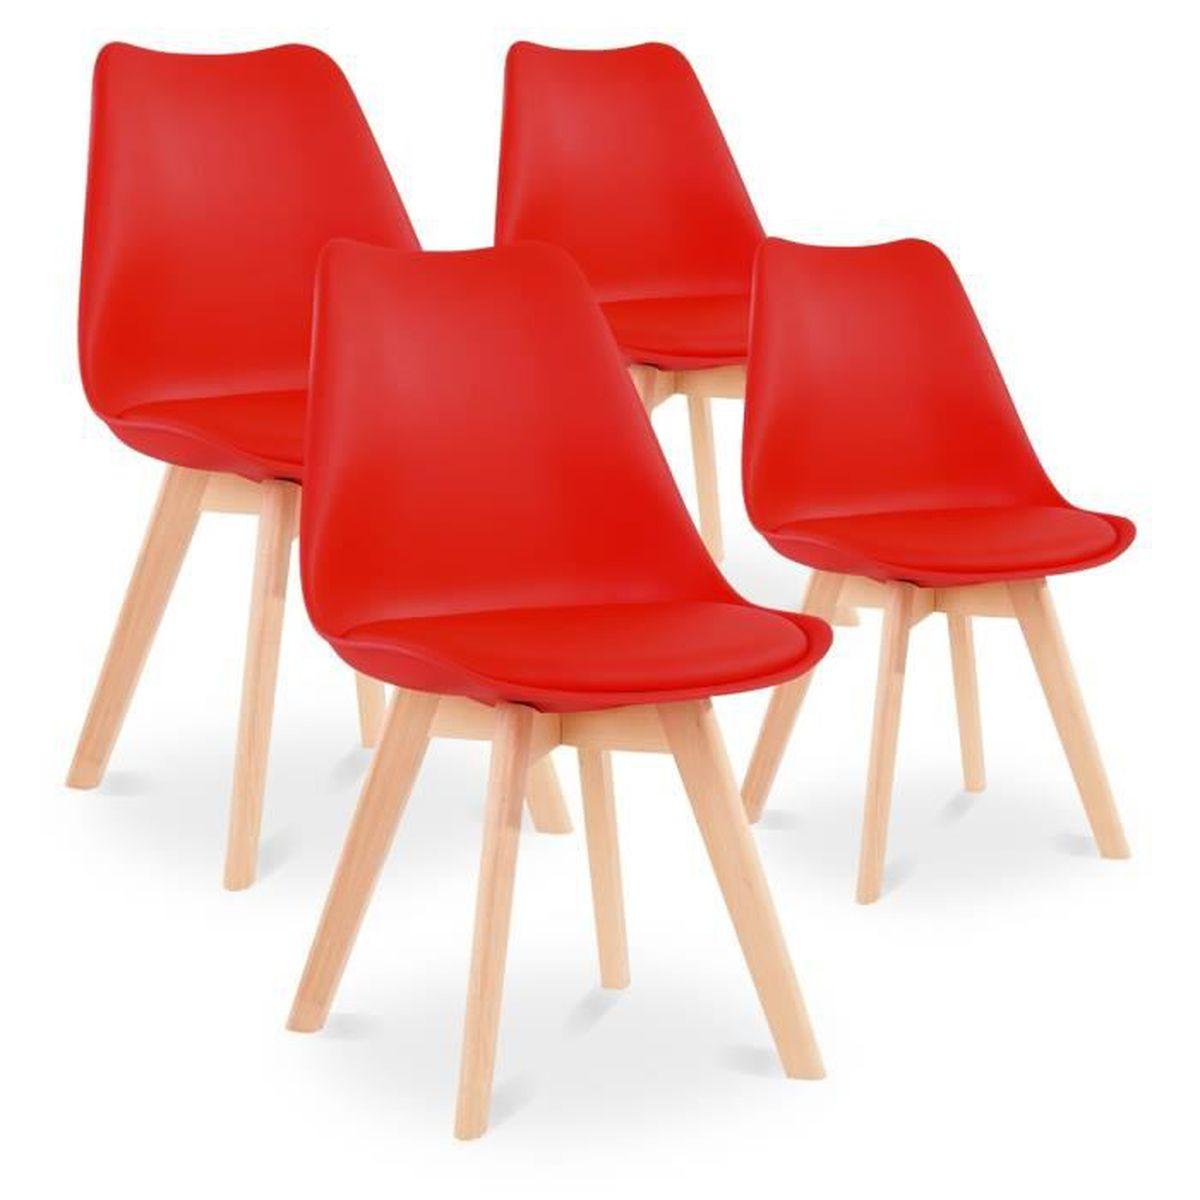 Lot de 6 chaises style scandinave Catherina Rouge - Achat / Vente